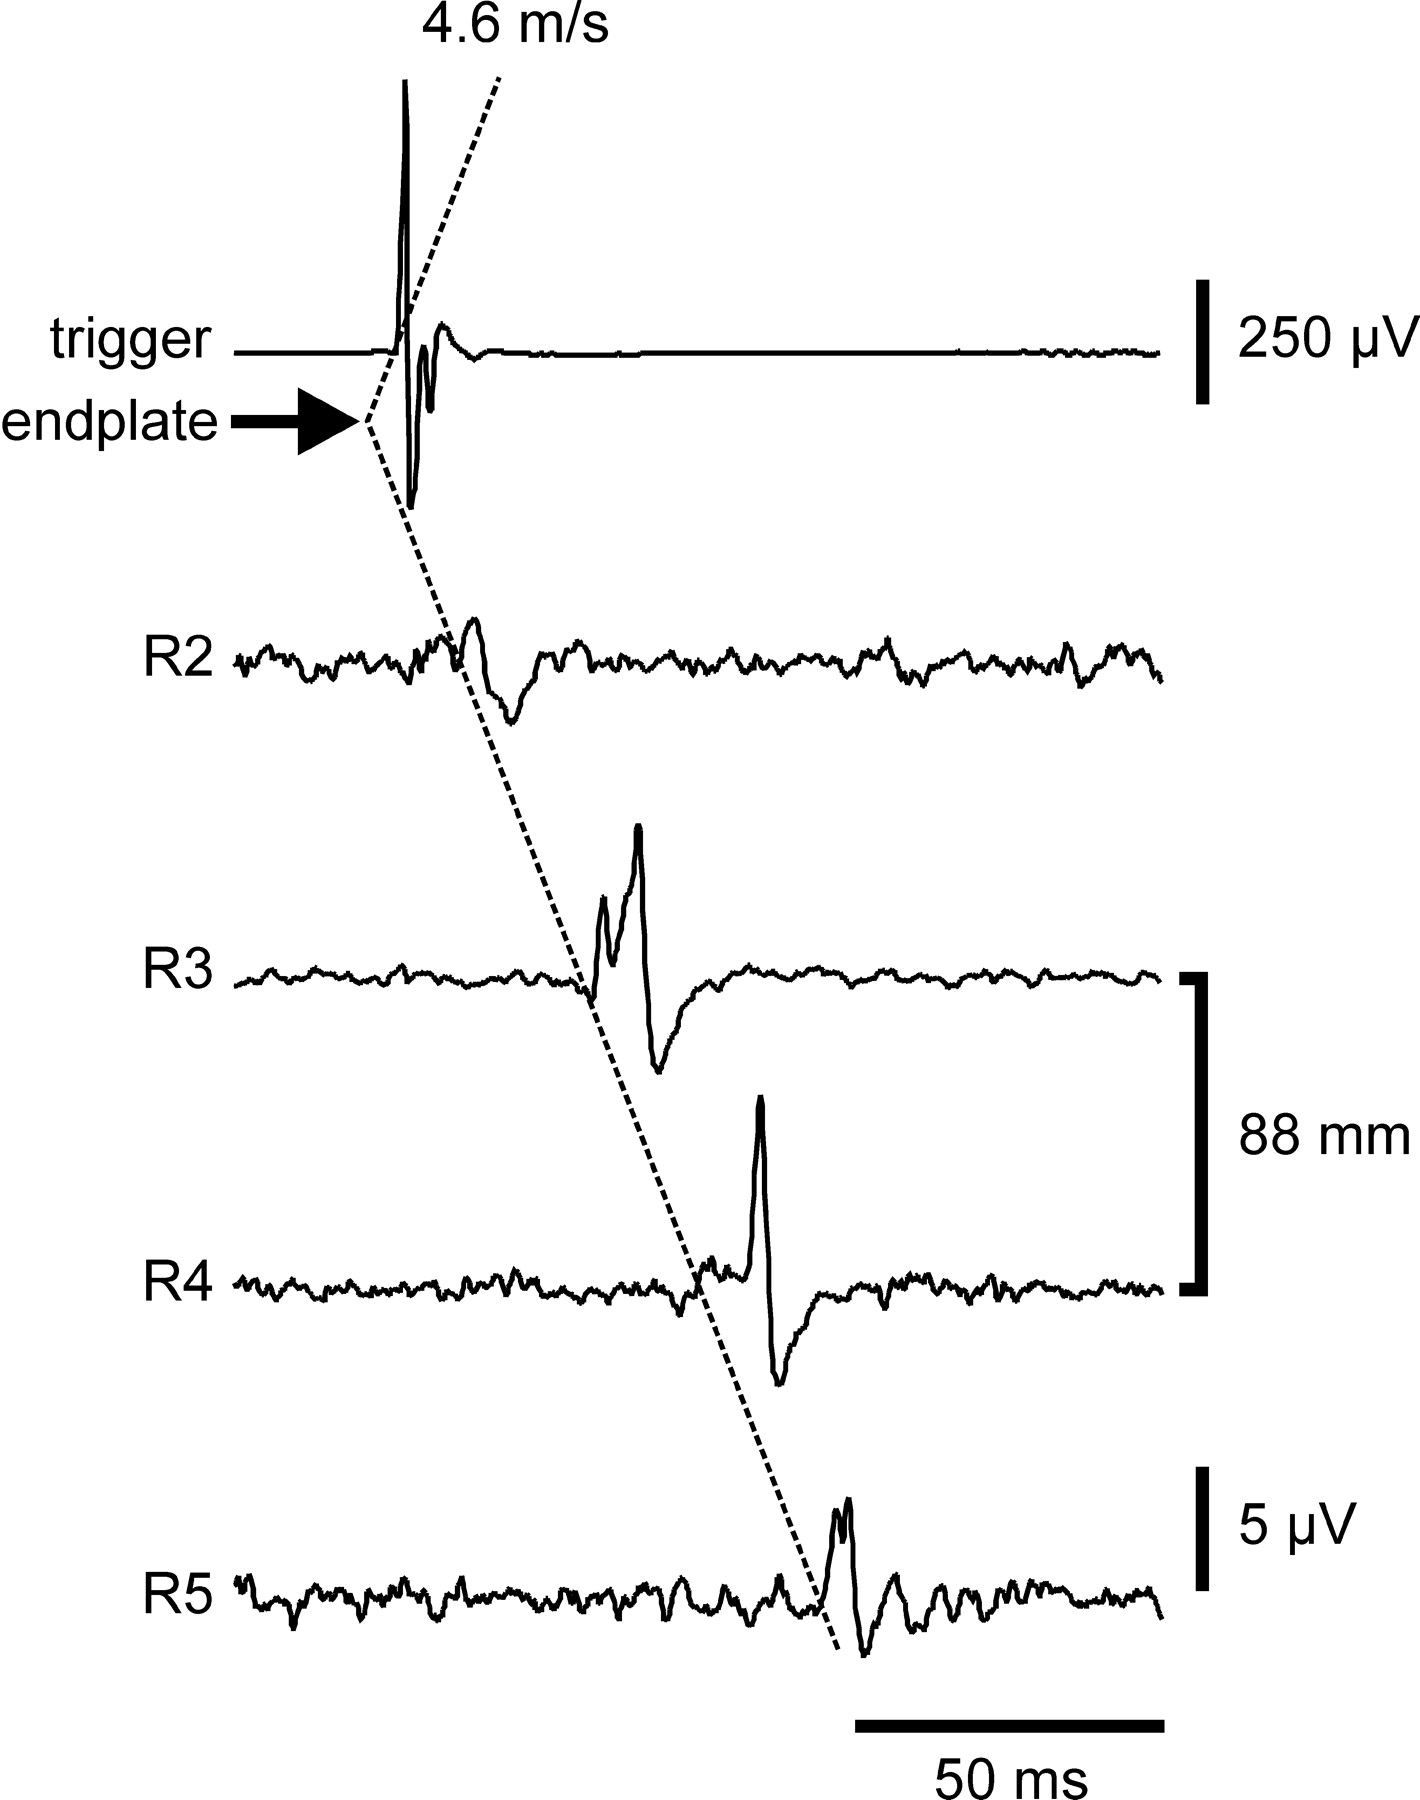 Muscle Fiber And Motor Unit Behavior In The Longest Human Skeletal 1973 Evinrude 135 Wiring Diagram Download Figure